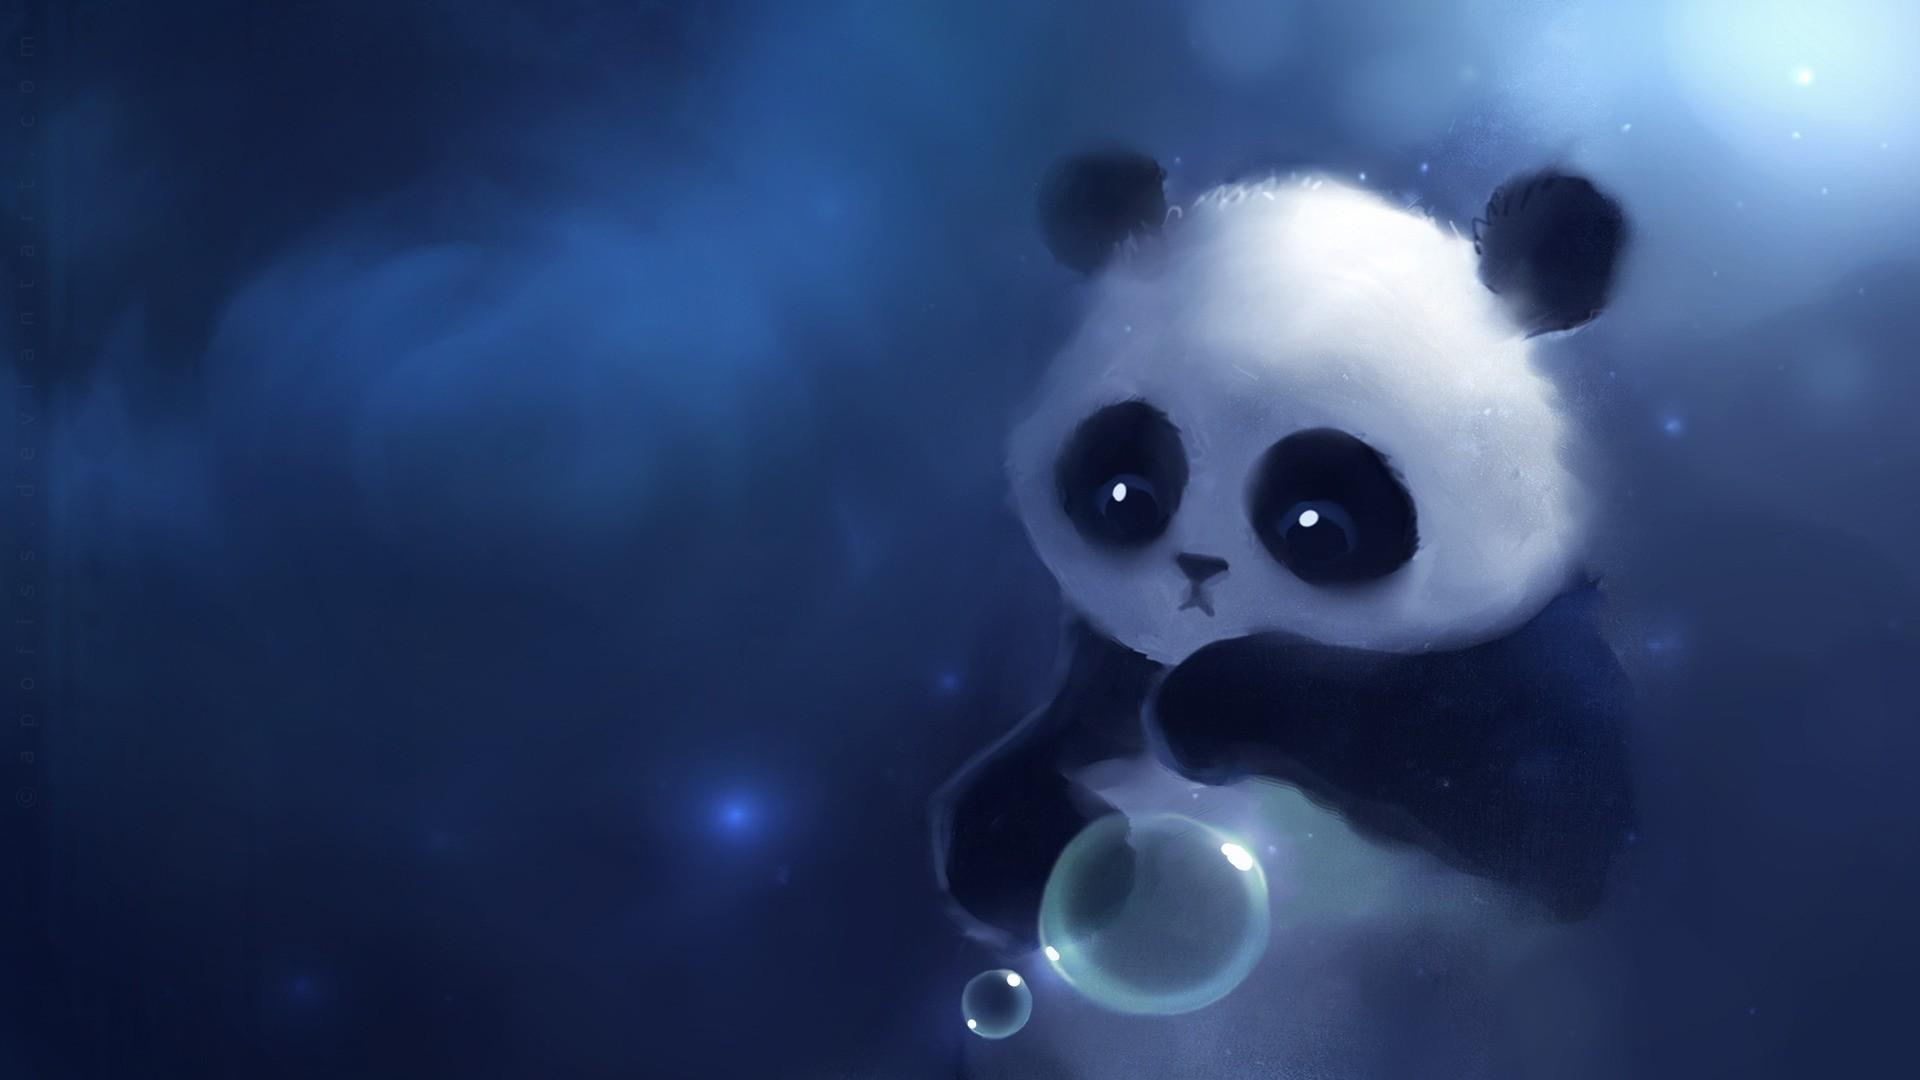 hinh gau truc panda 14